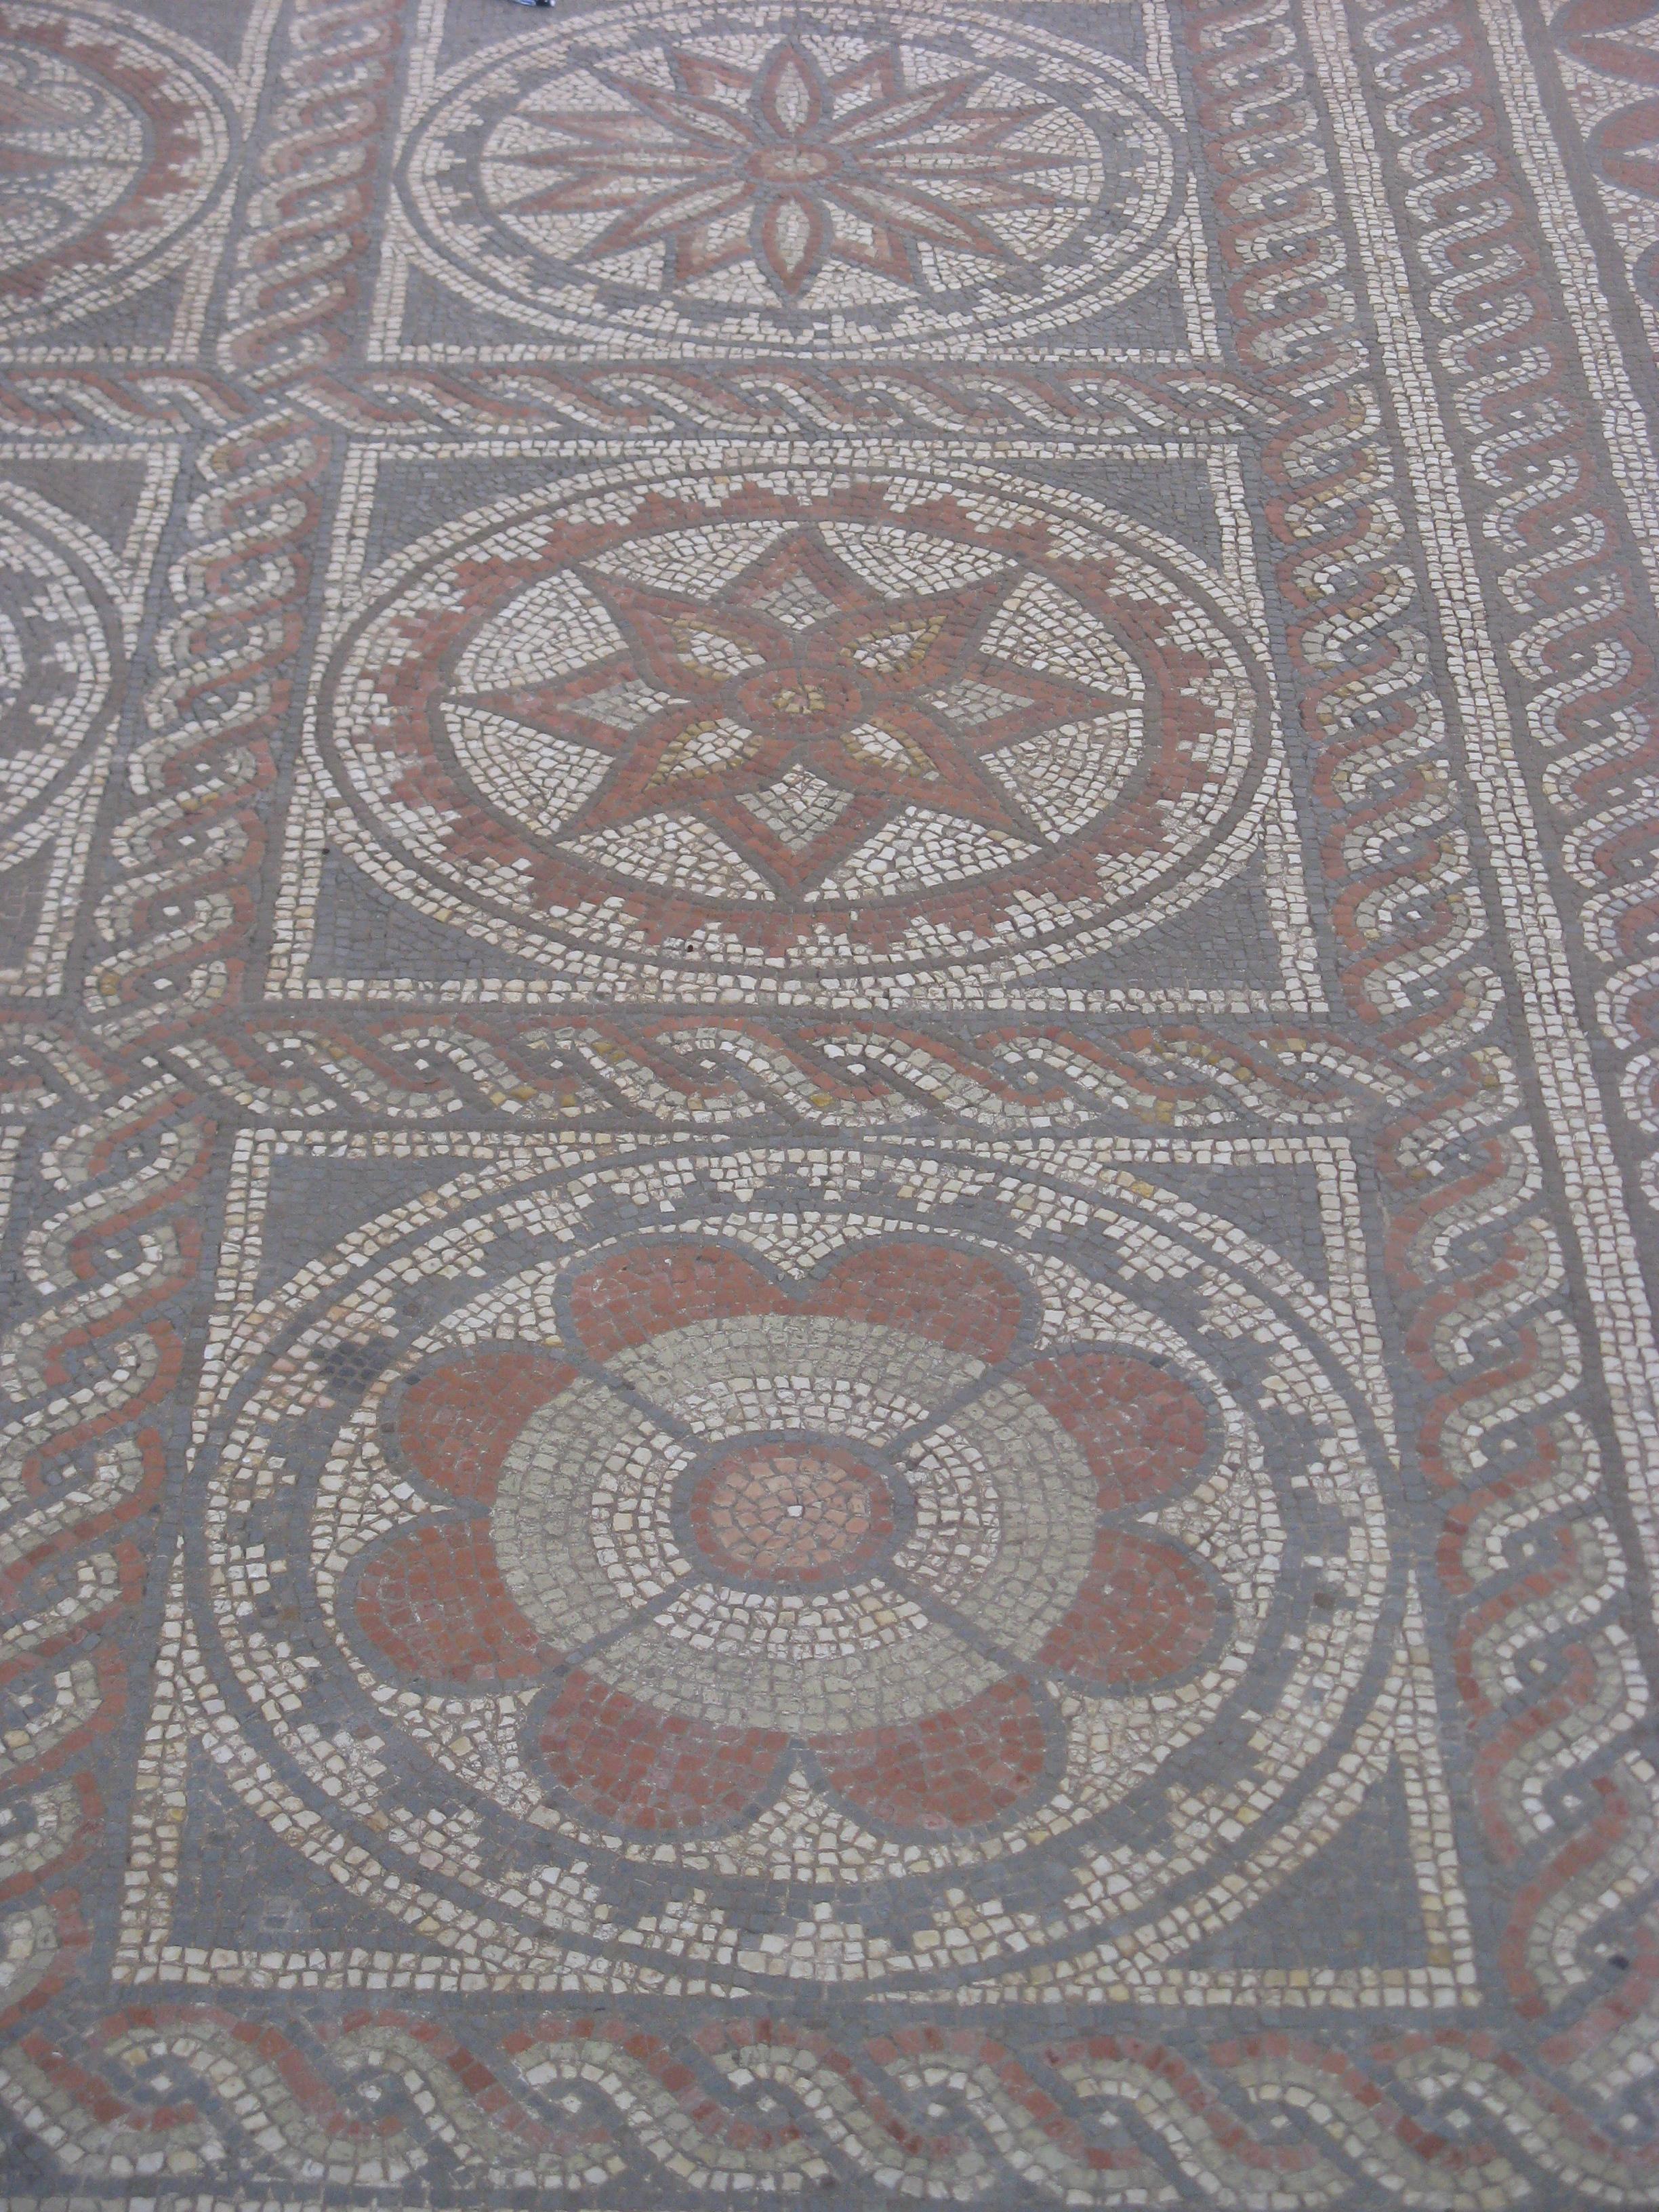 Roman Mosaics Archaeology St Albans Herts Memories